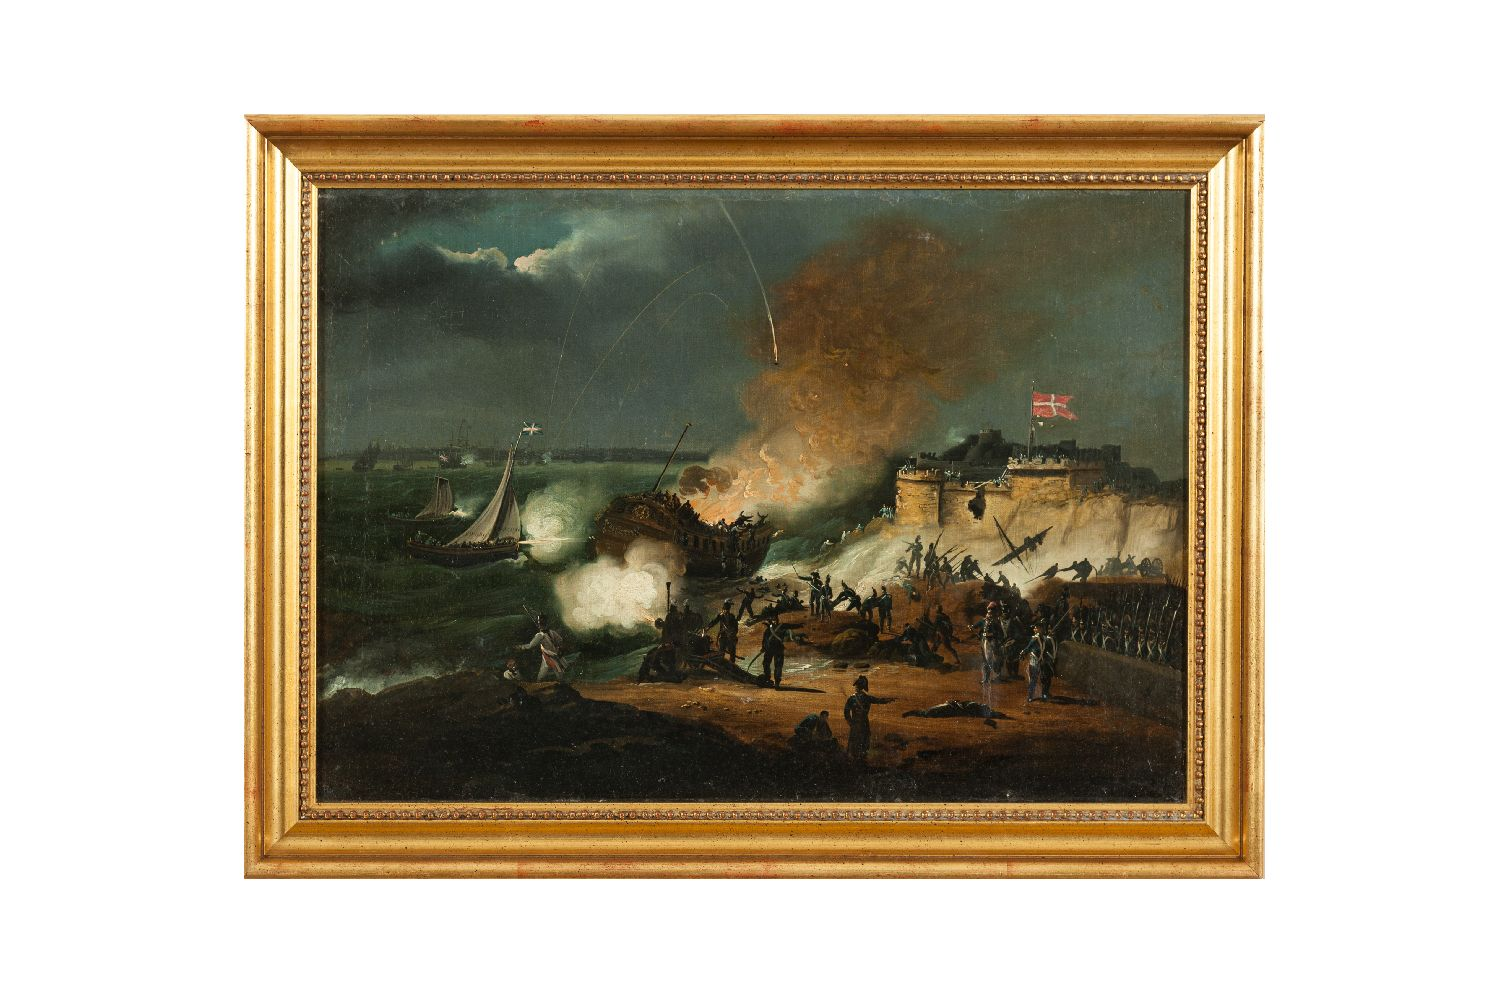 Lot 210 - William Sadler II (c.1782-1839)Battle of Copenhagen - 1801Oil on canvas, 38.25 x 54.5cm (15¼ x 21½)